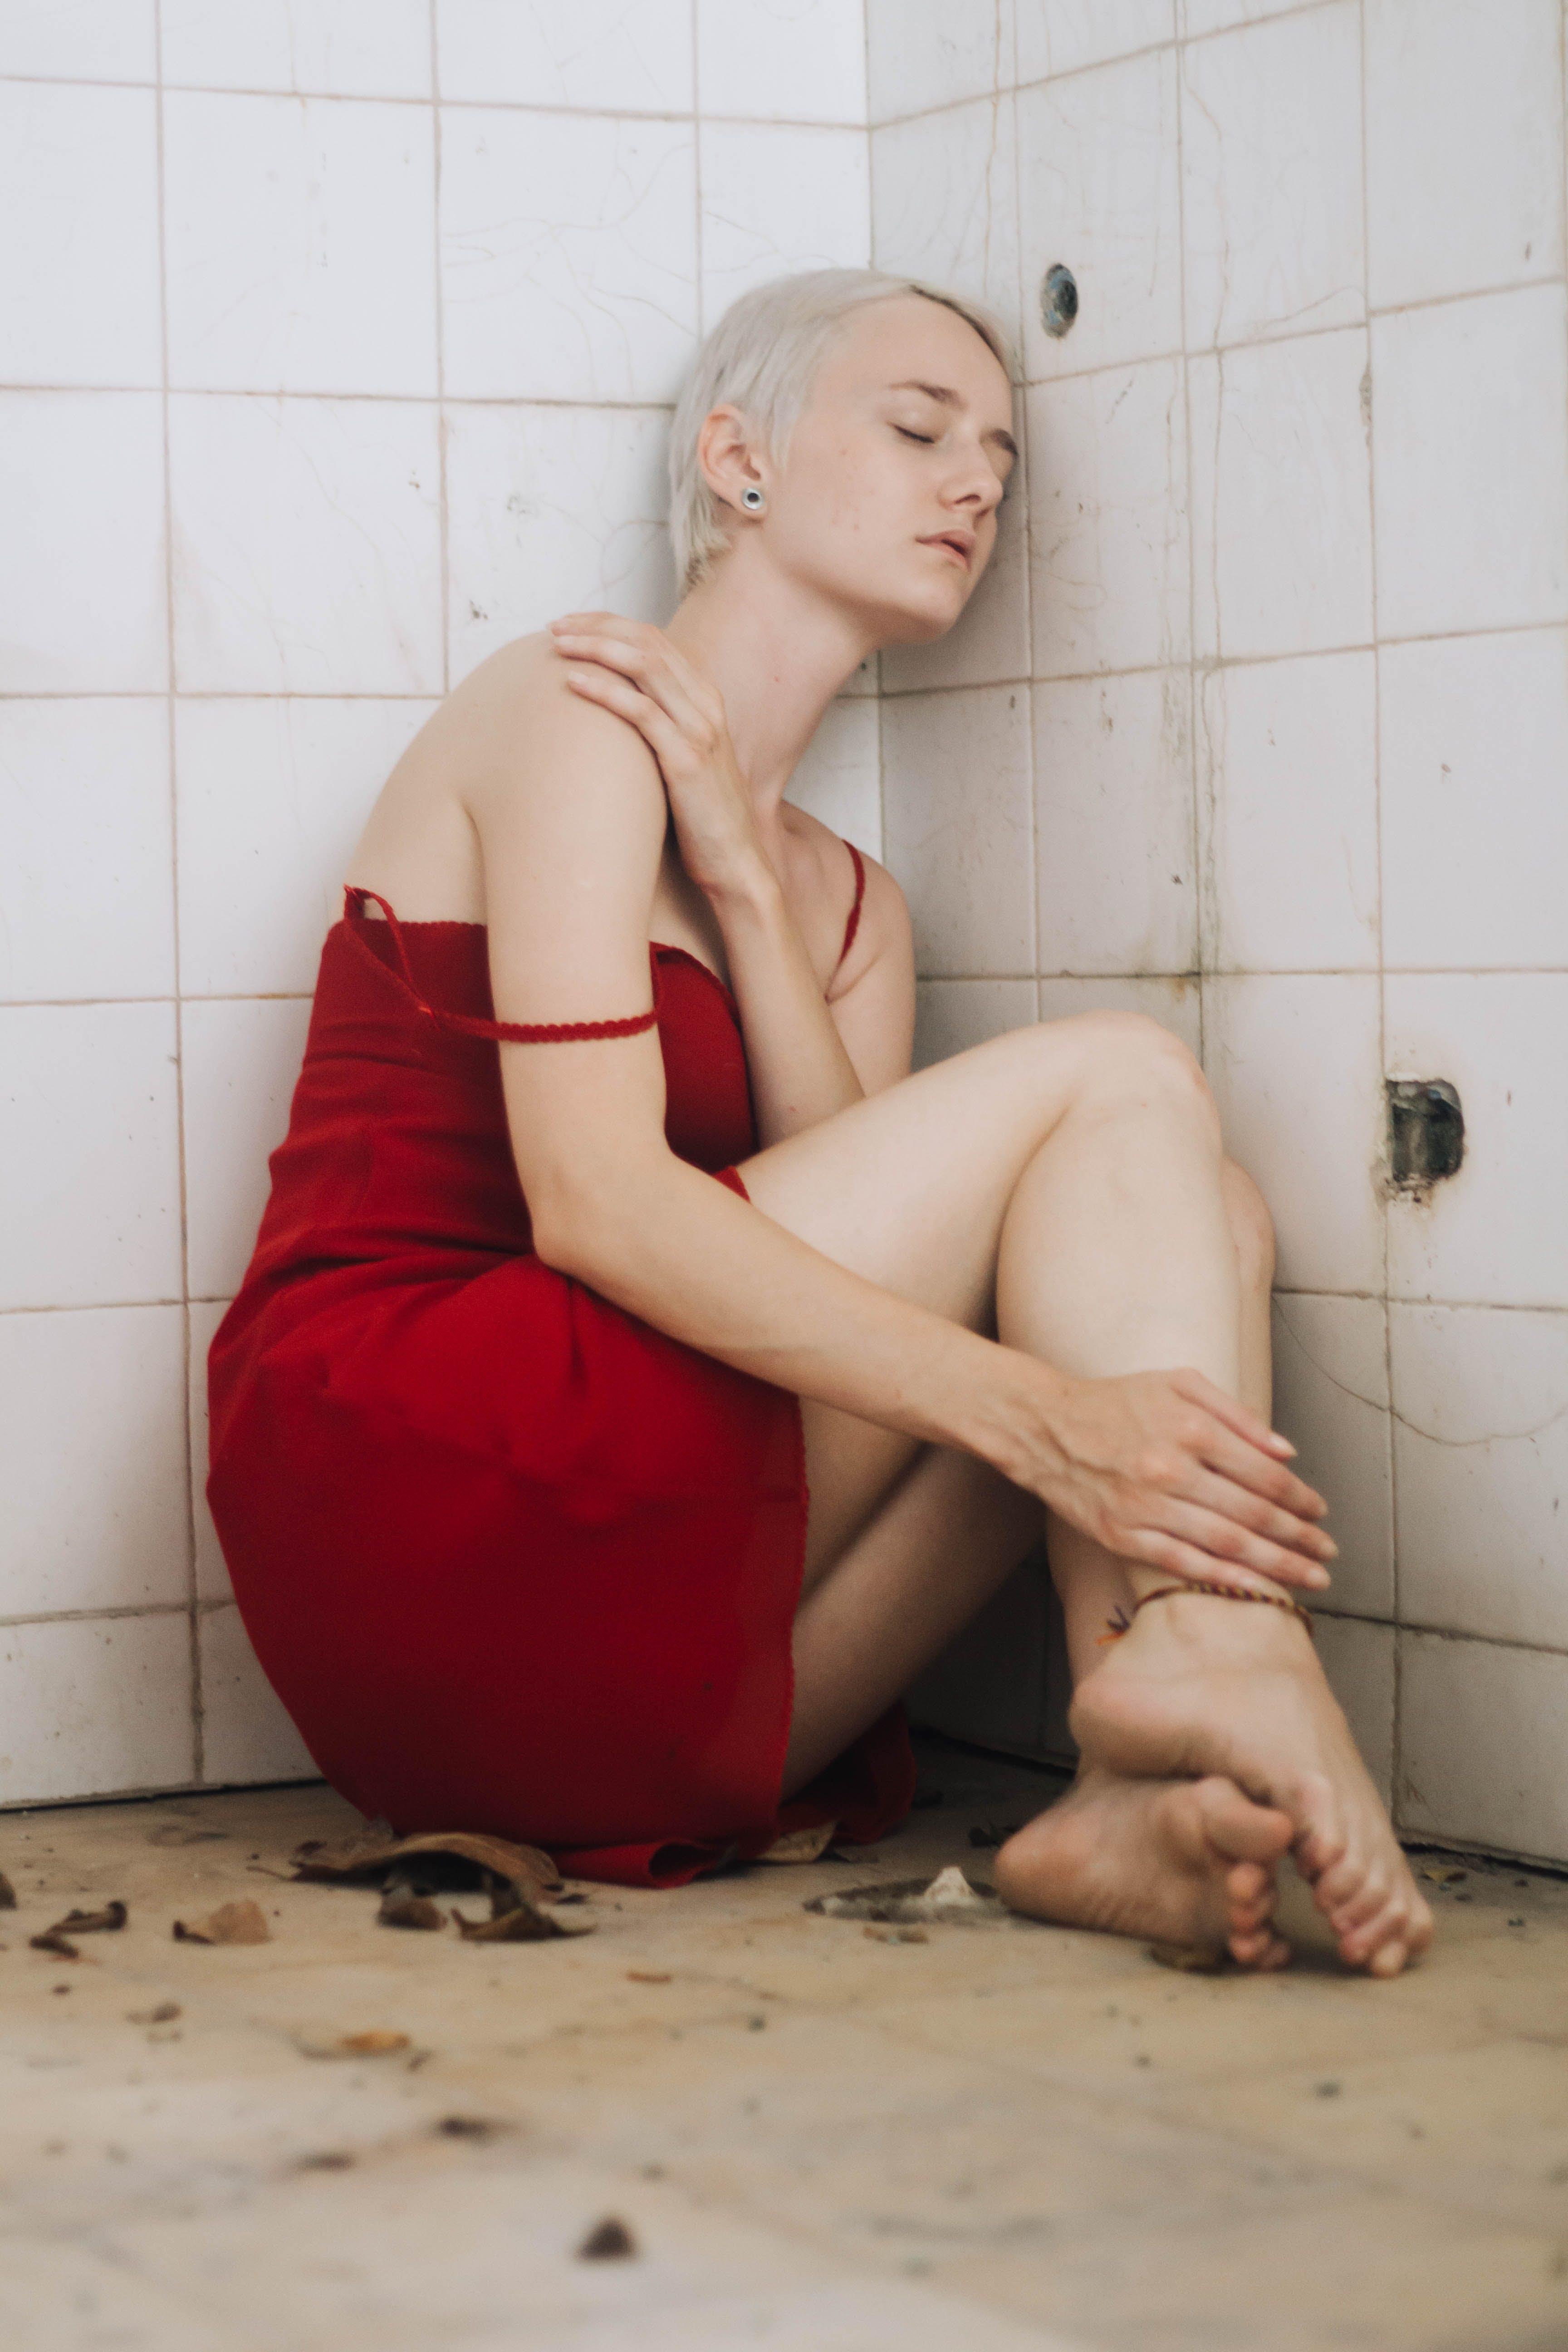 Woman Wearing Red Dress Sitting on Floor